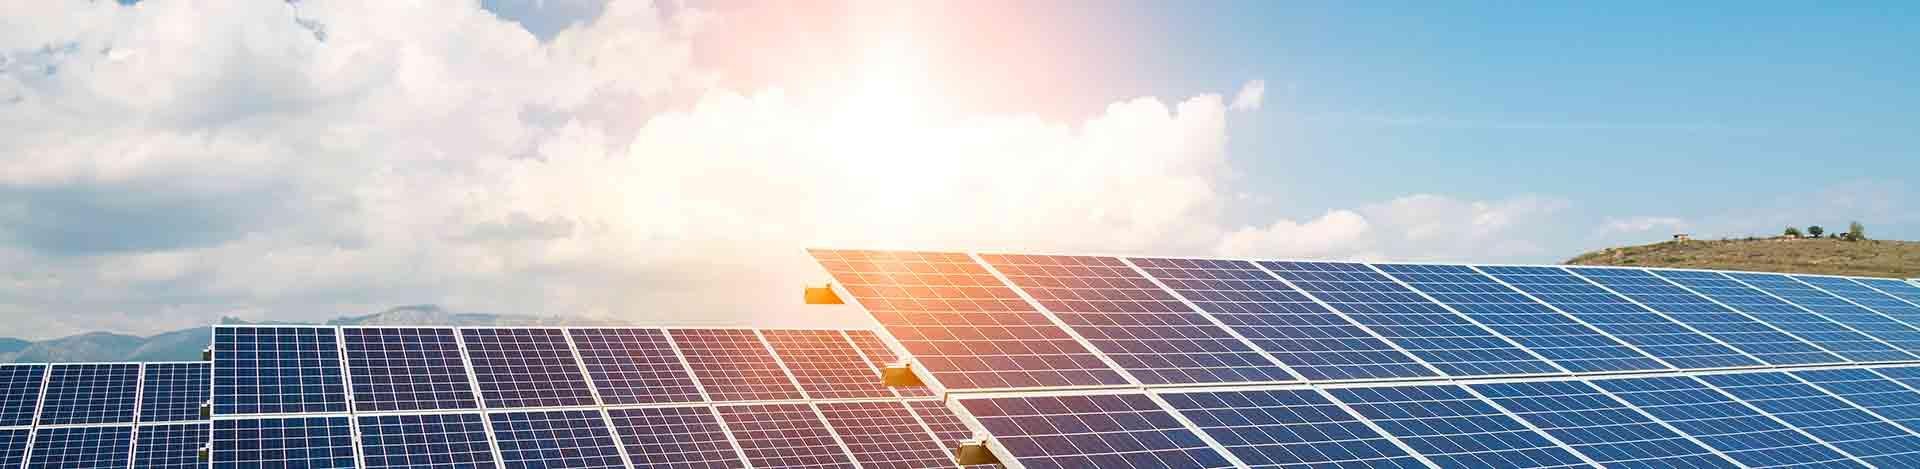 Sunvie, design and development of solar installations